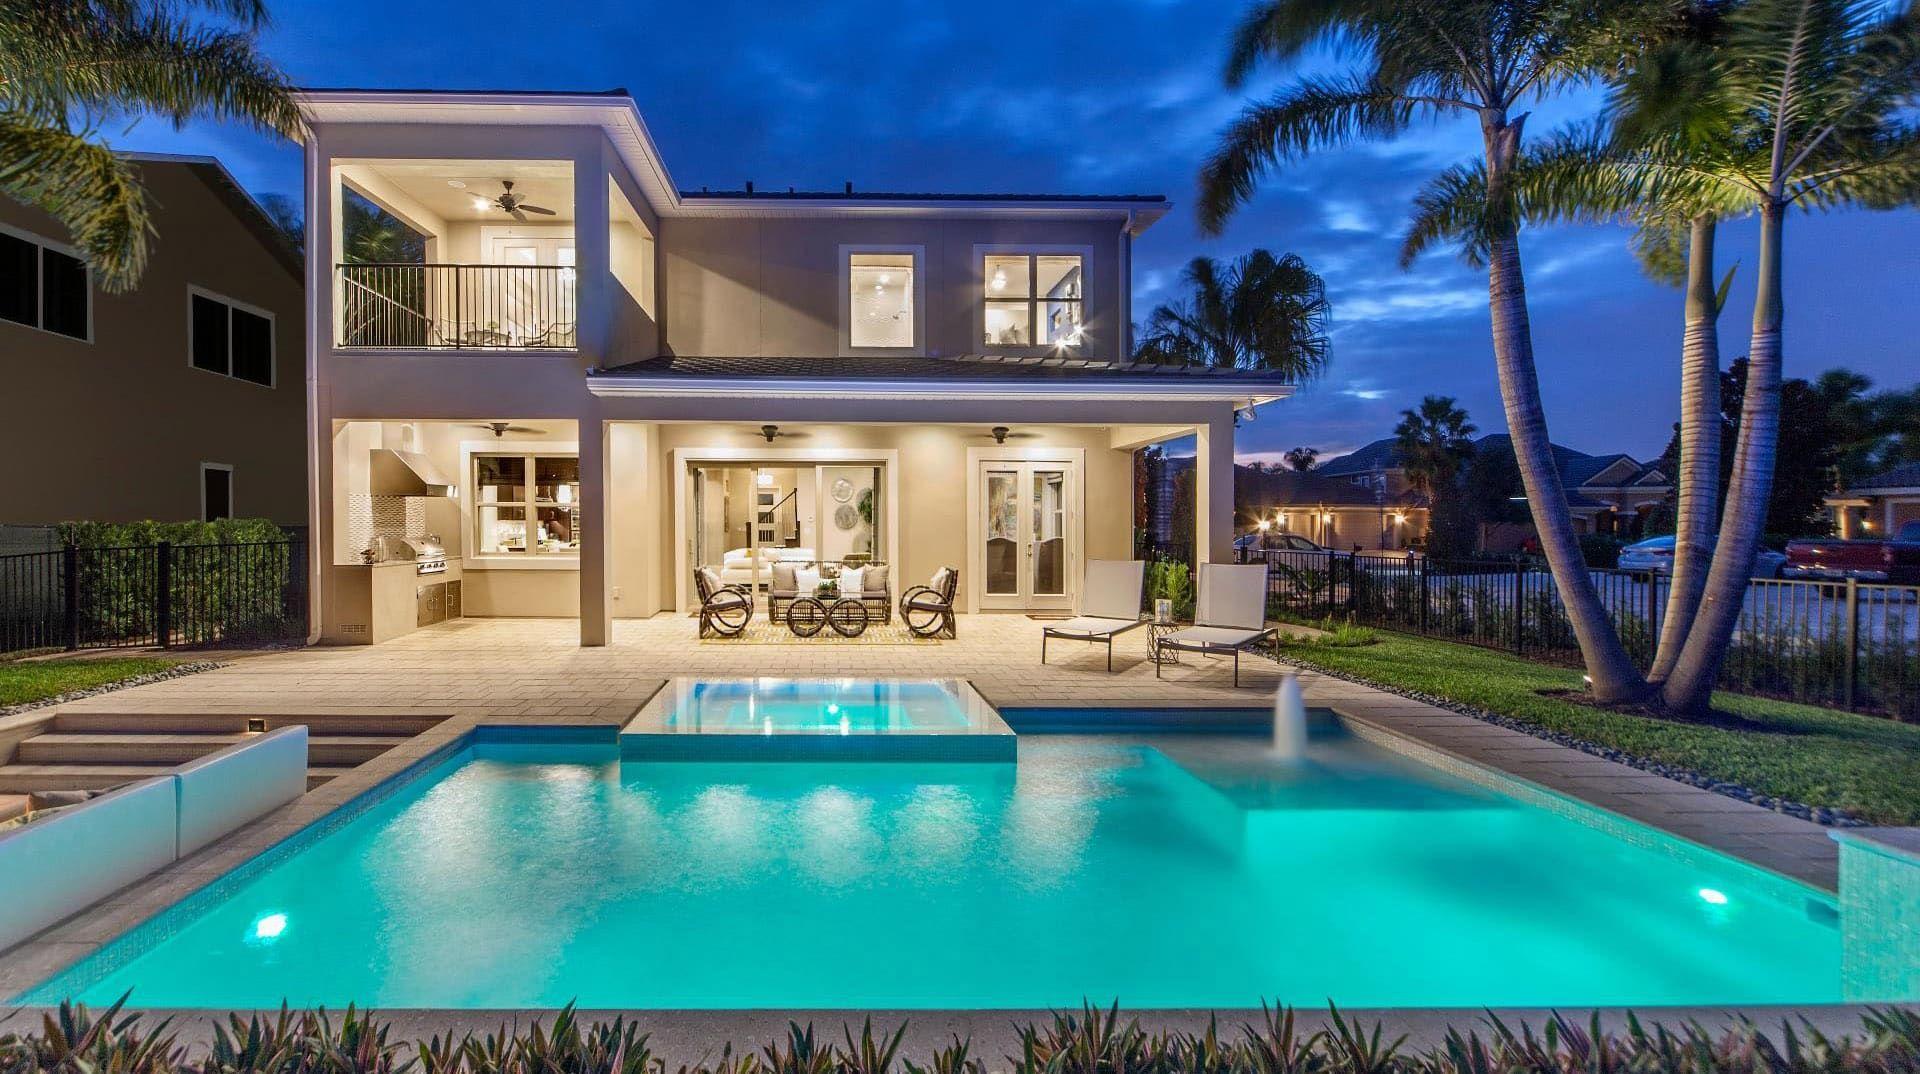 florida keys investment mortgage, florida keys investment property mortgage, florida keys investment home loan